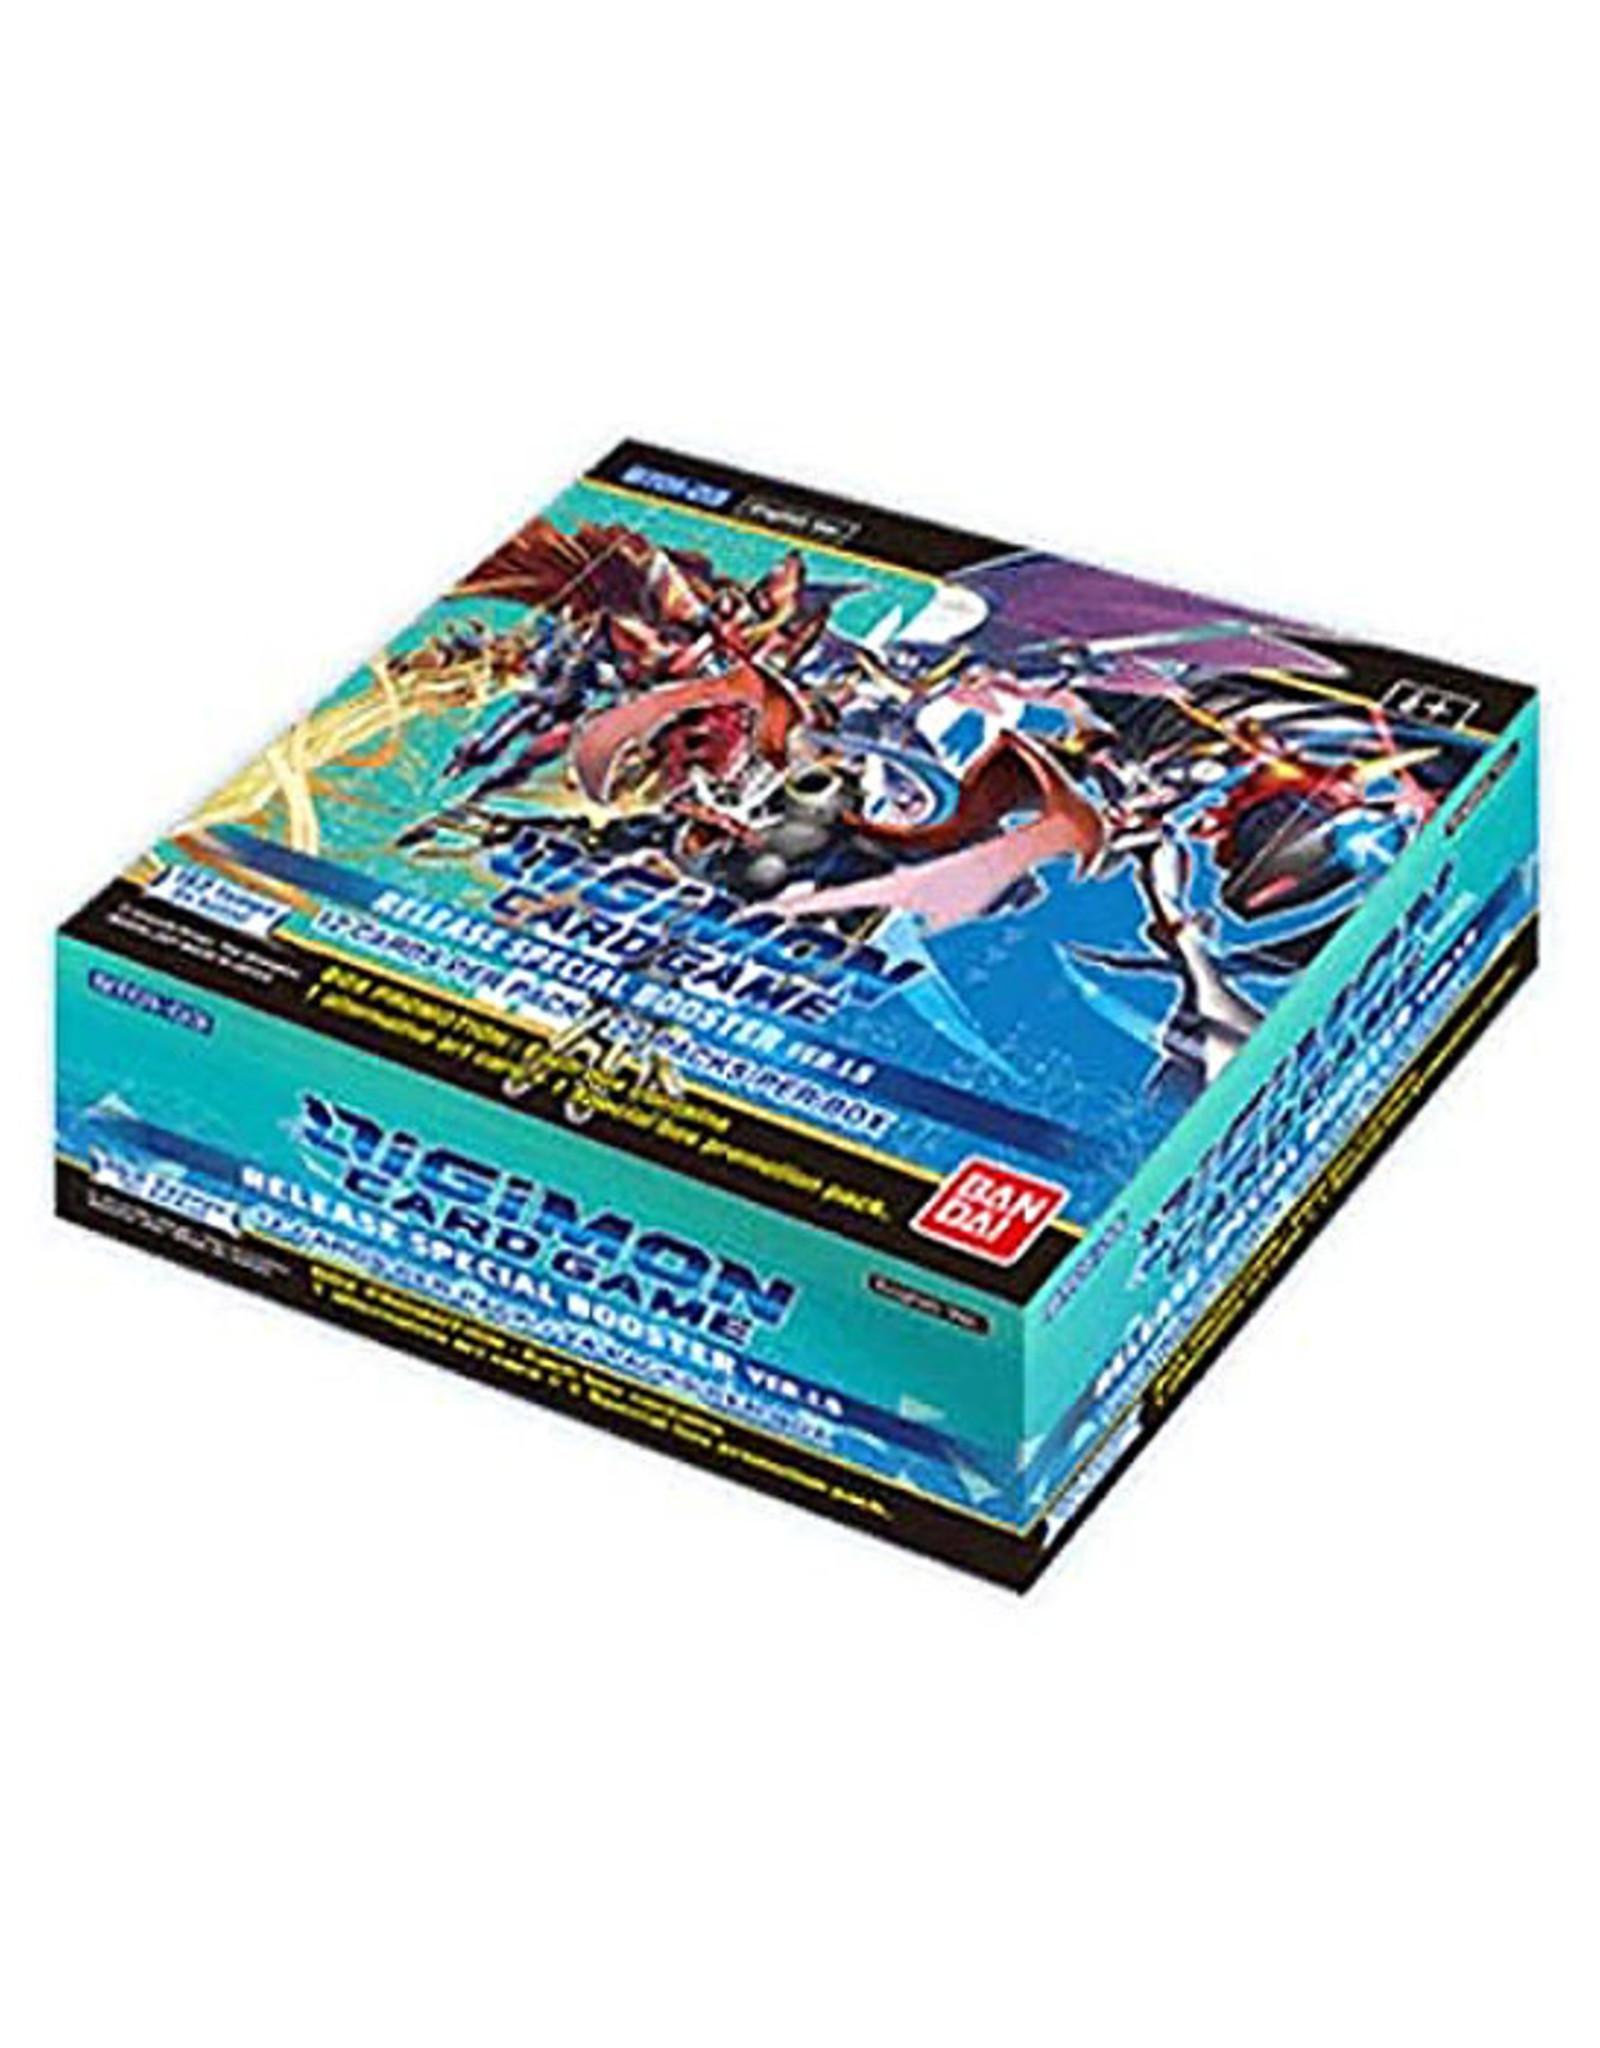 Bandai Digimon TCG: Release Special Ver. 1.5 - Booster Box